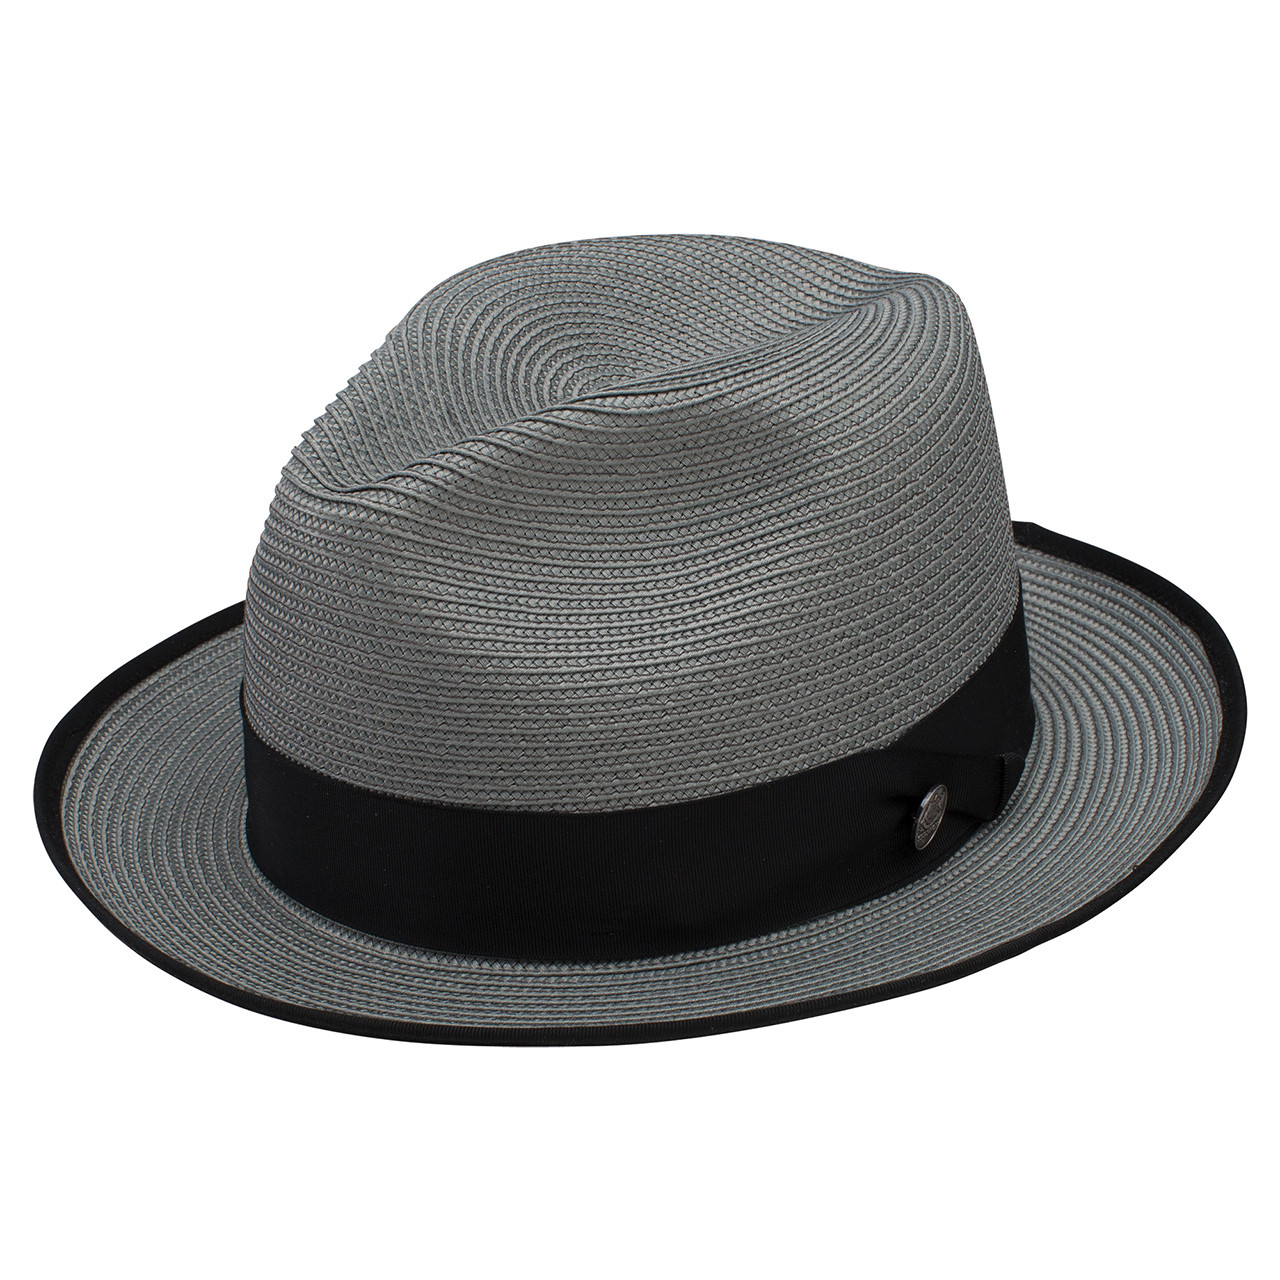 d8a678932a4 Stetson Latte Gray Florentine Milan Firm Finish Straw Hat